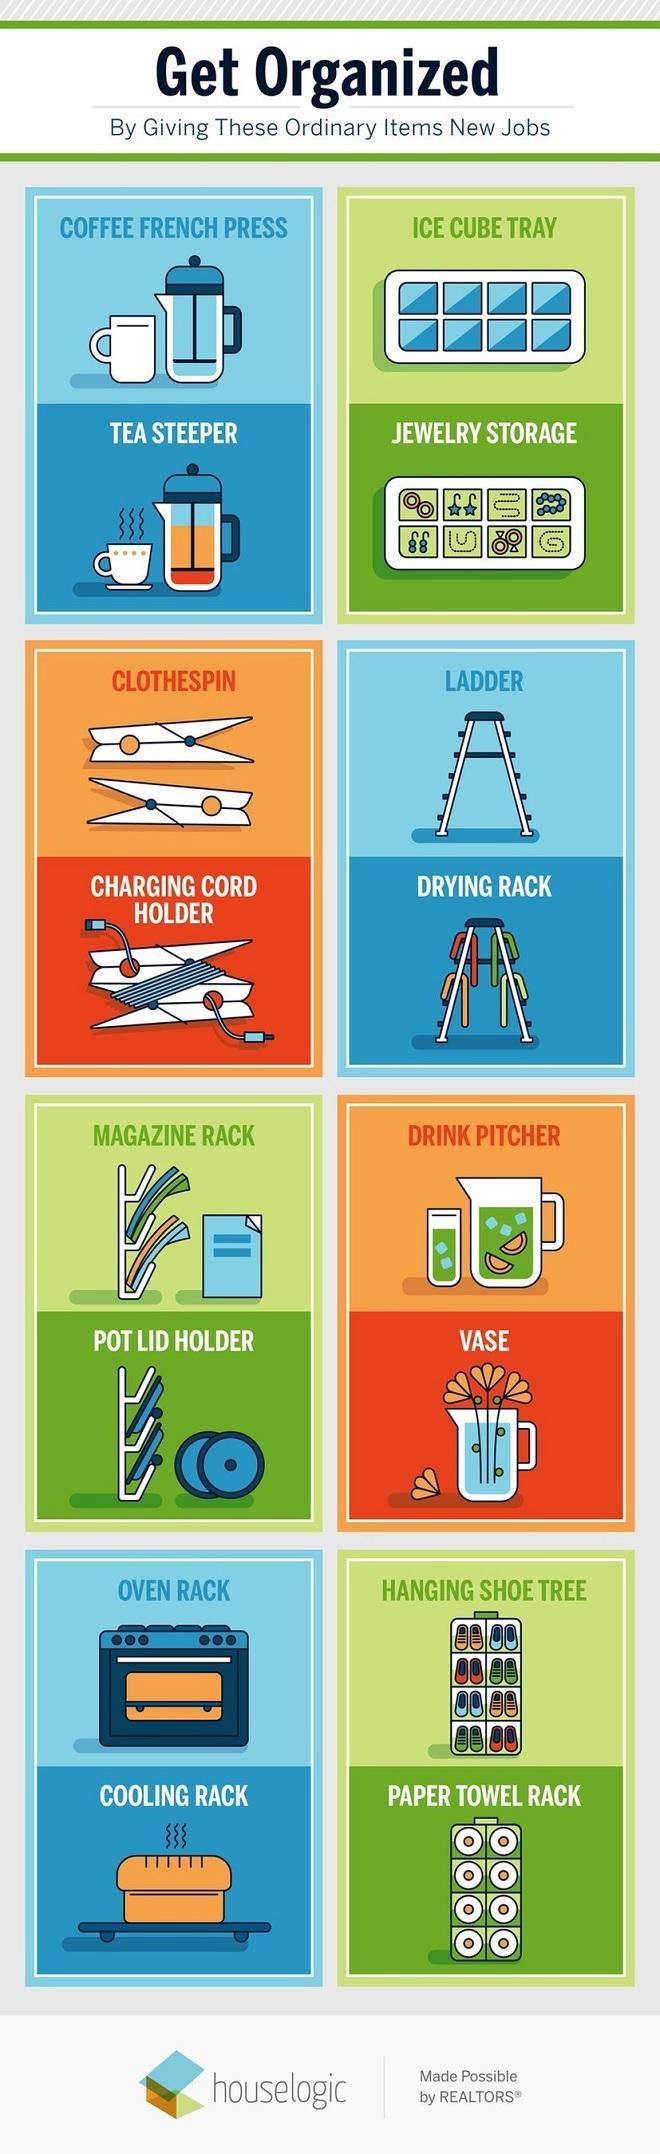 get-organized-infographic